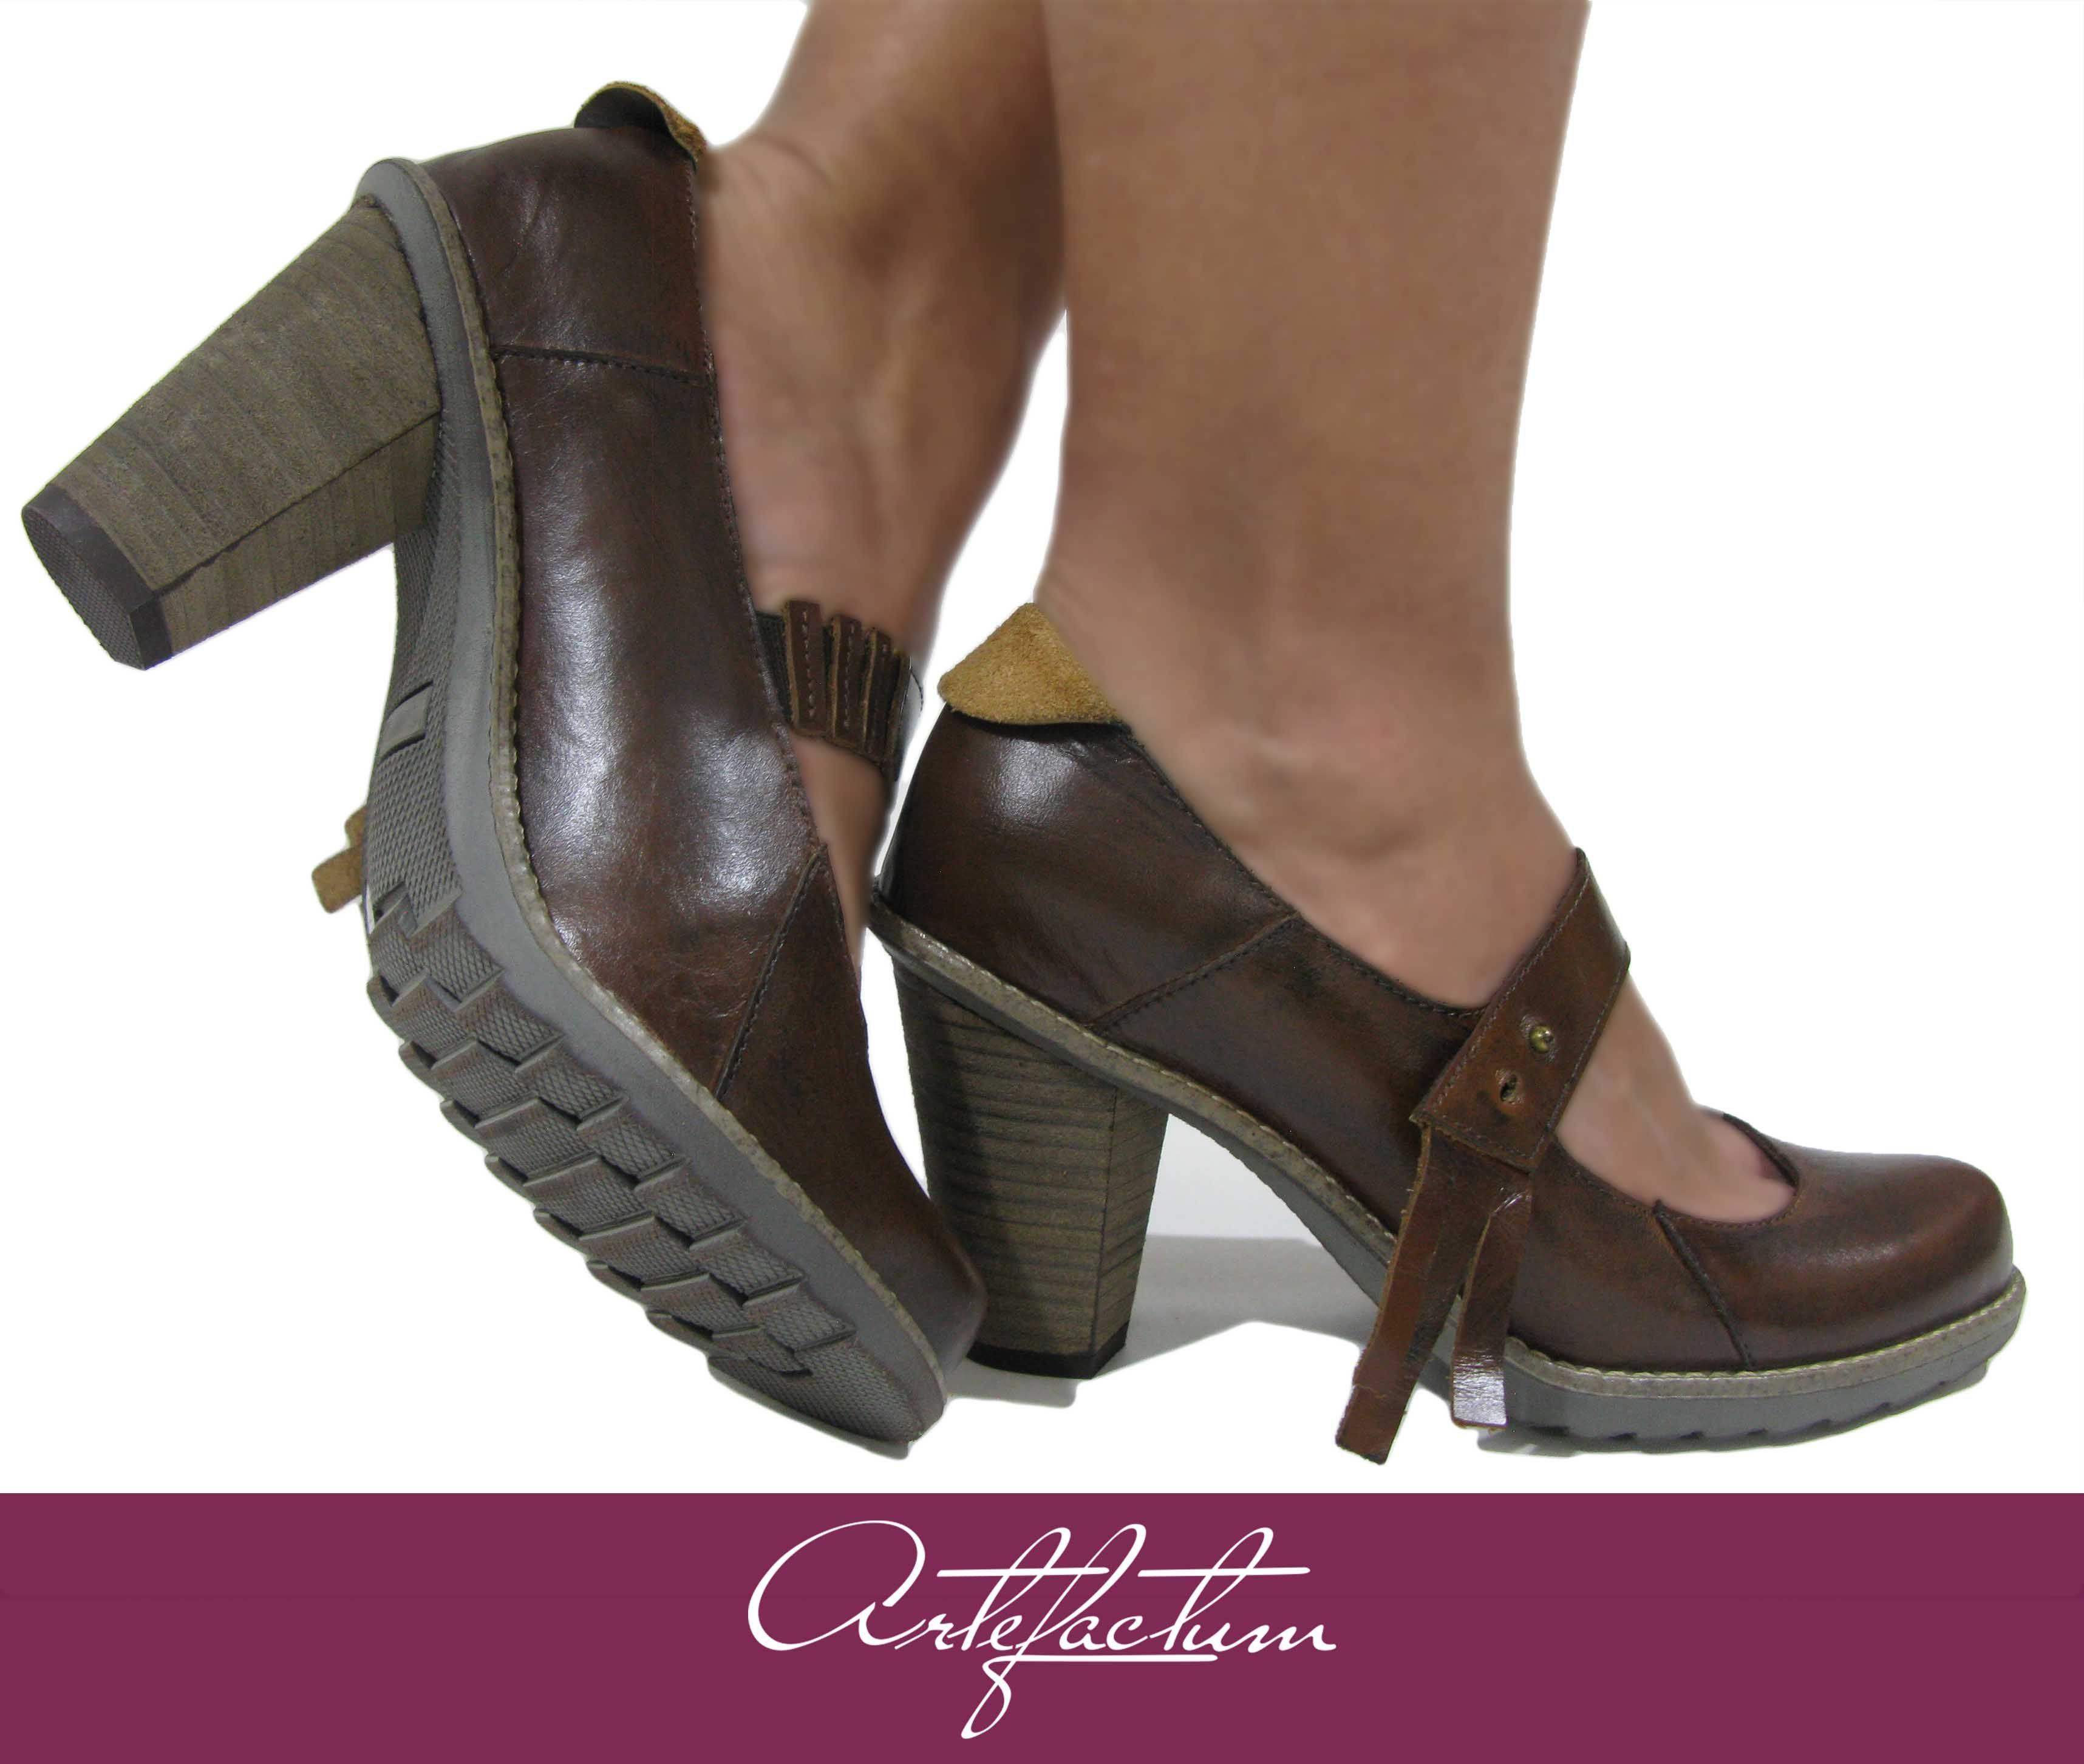 zapatos en cuero, Artefactum. https://www.facebook.com/pages/Artefactum-SAS/843499389007766?sk=photos_stream